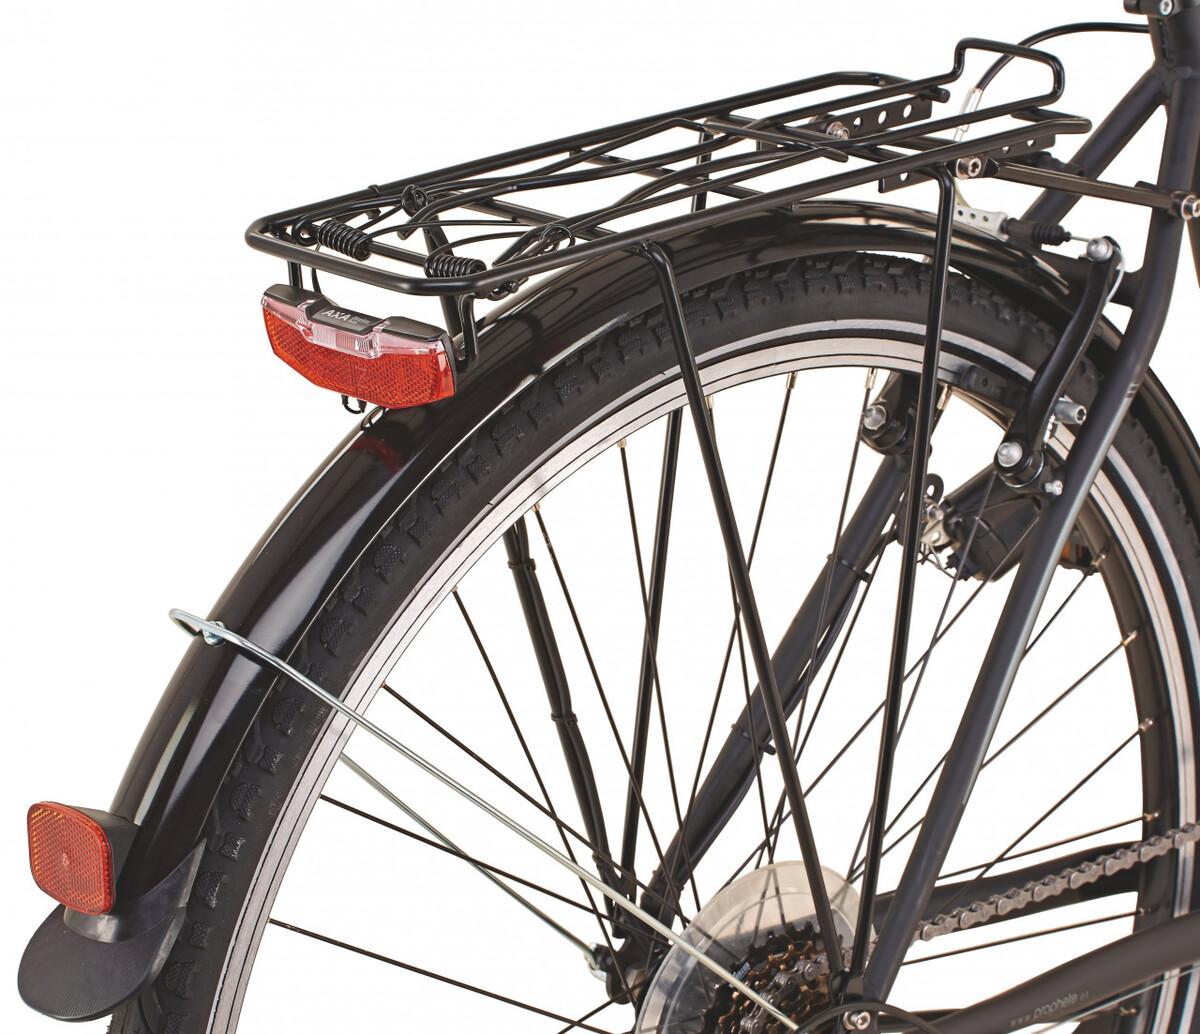 Bild 4 von Prophete Entdecker Herren-Trekking-Bike 28'' 20.BST.10